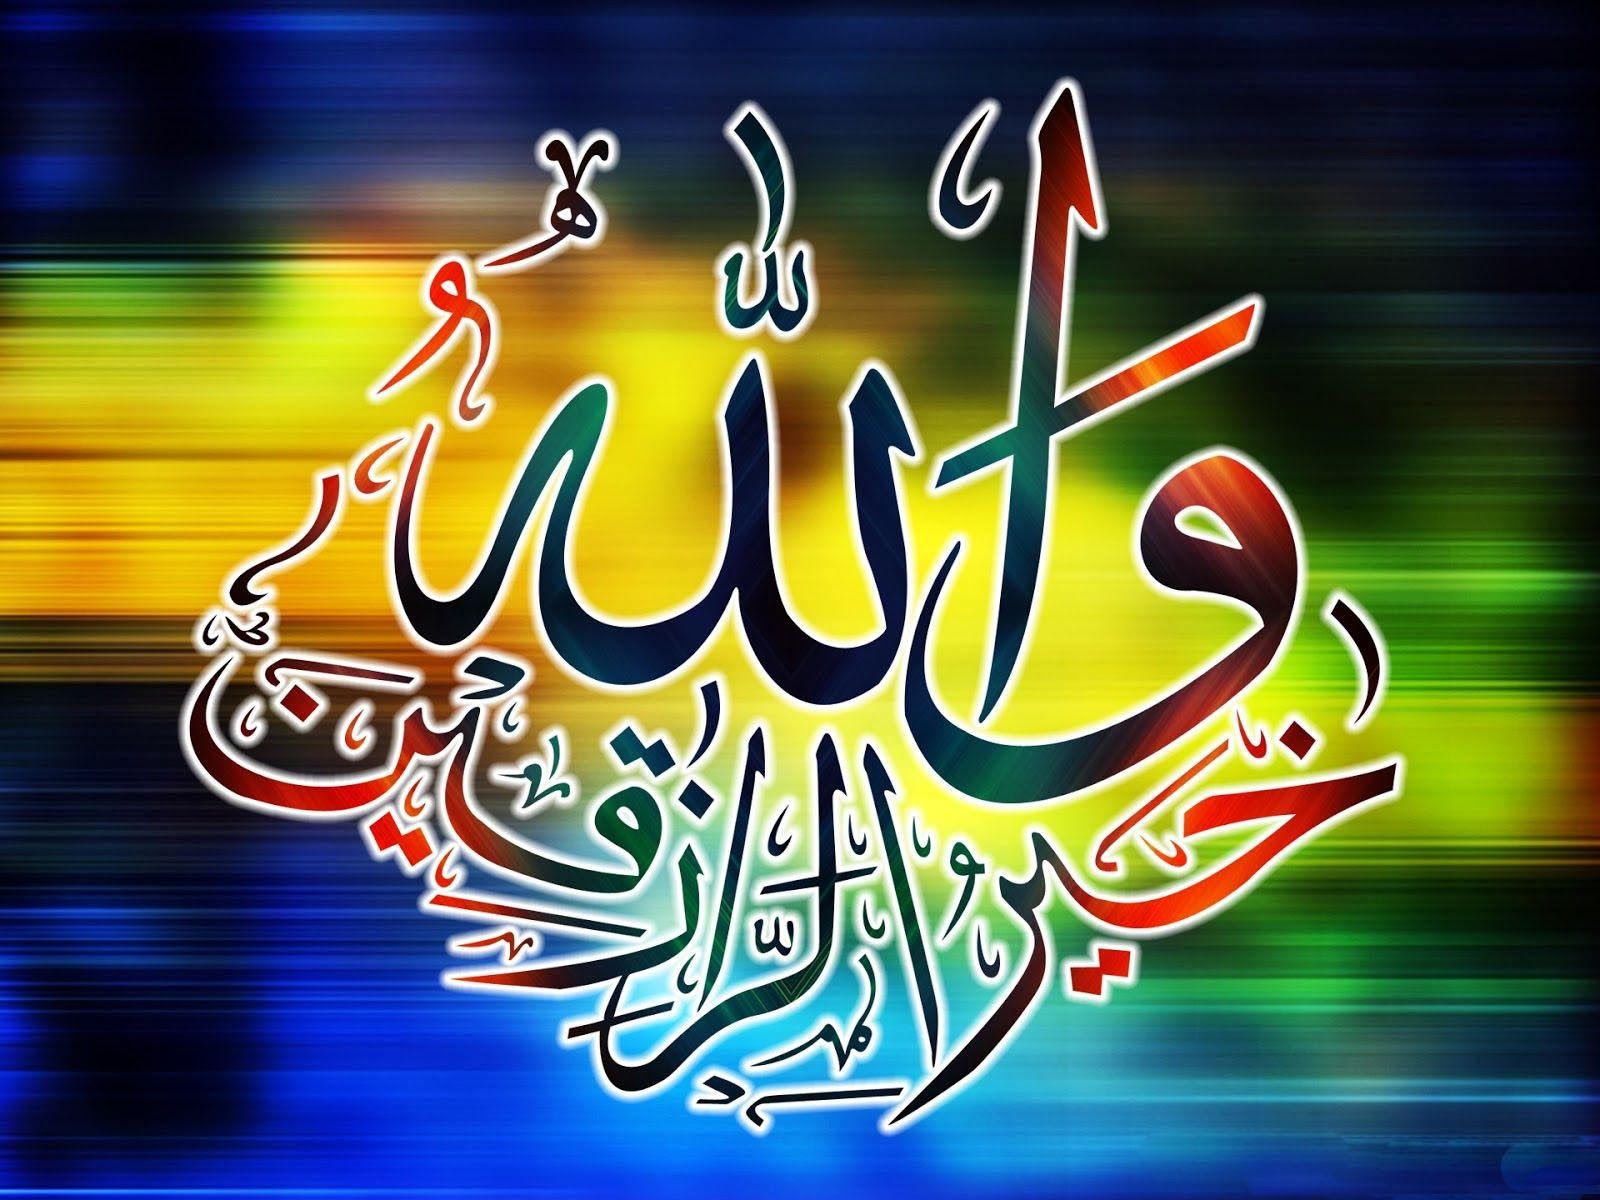 Islamic Hd Wallpaper Of Qurani Ayat Free Download Unique Wallpapers Islamic Wallpaper Islamic Wallpaper Hd Islamic Calligraphy